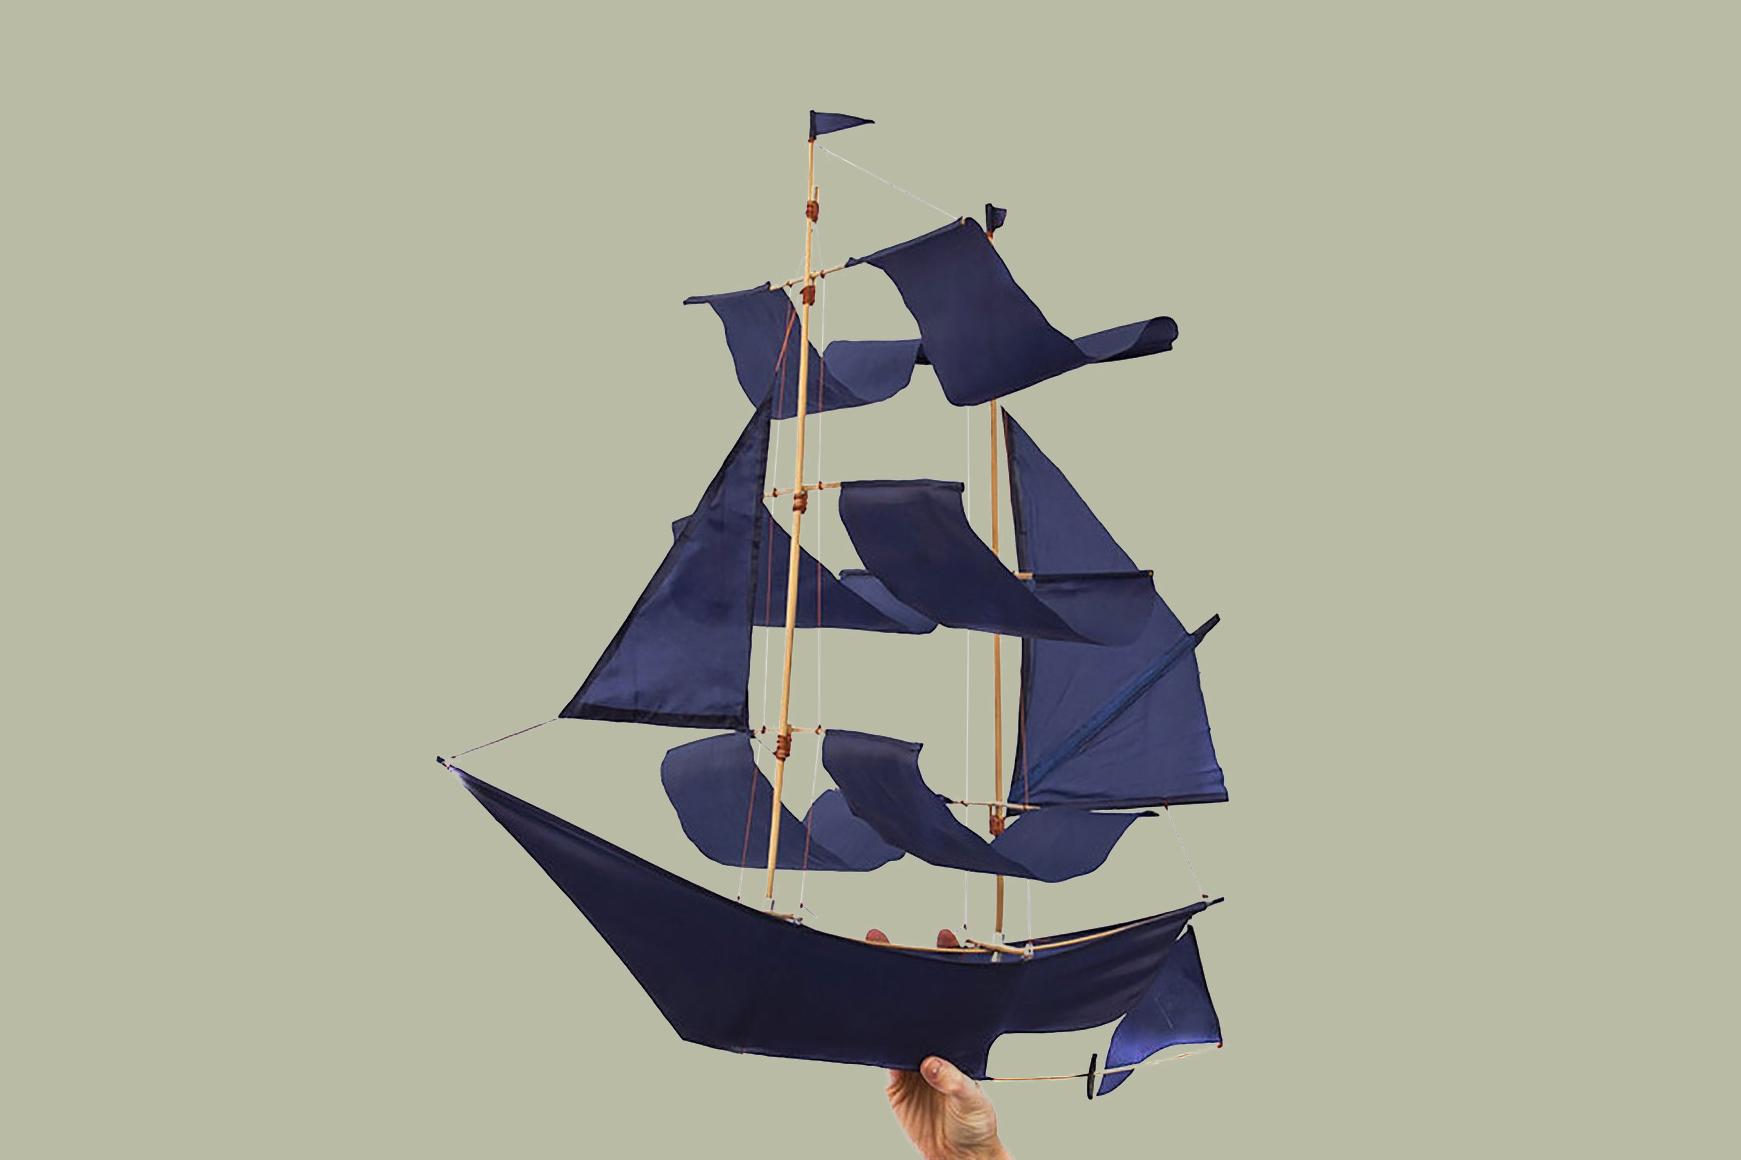 hand holding sail boat kite